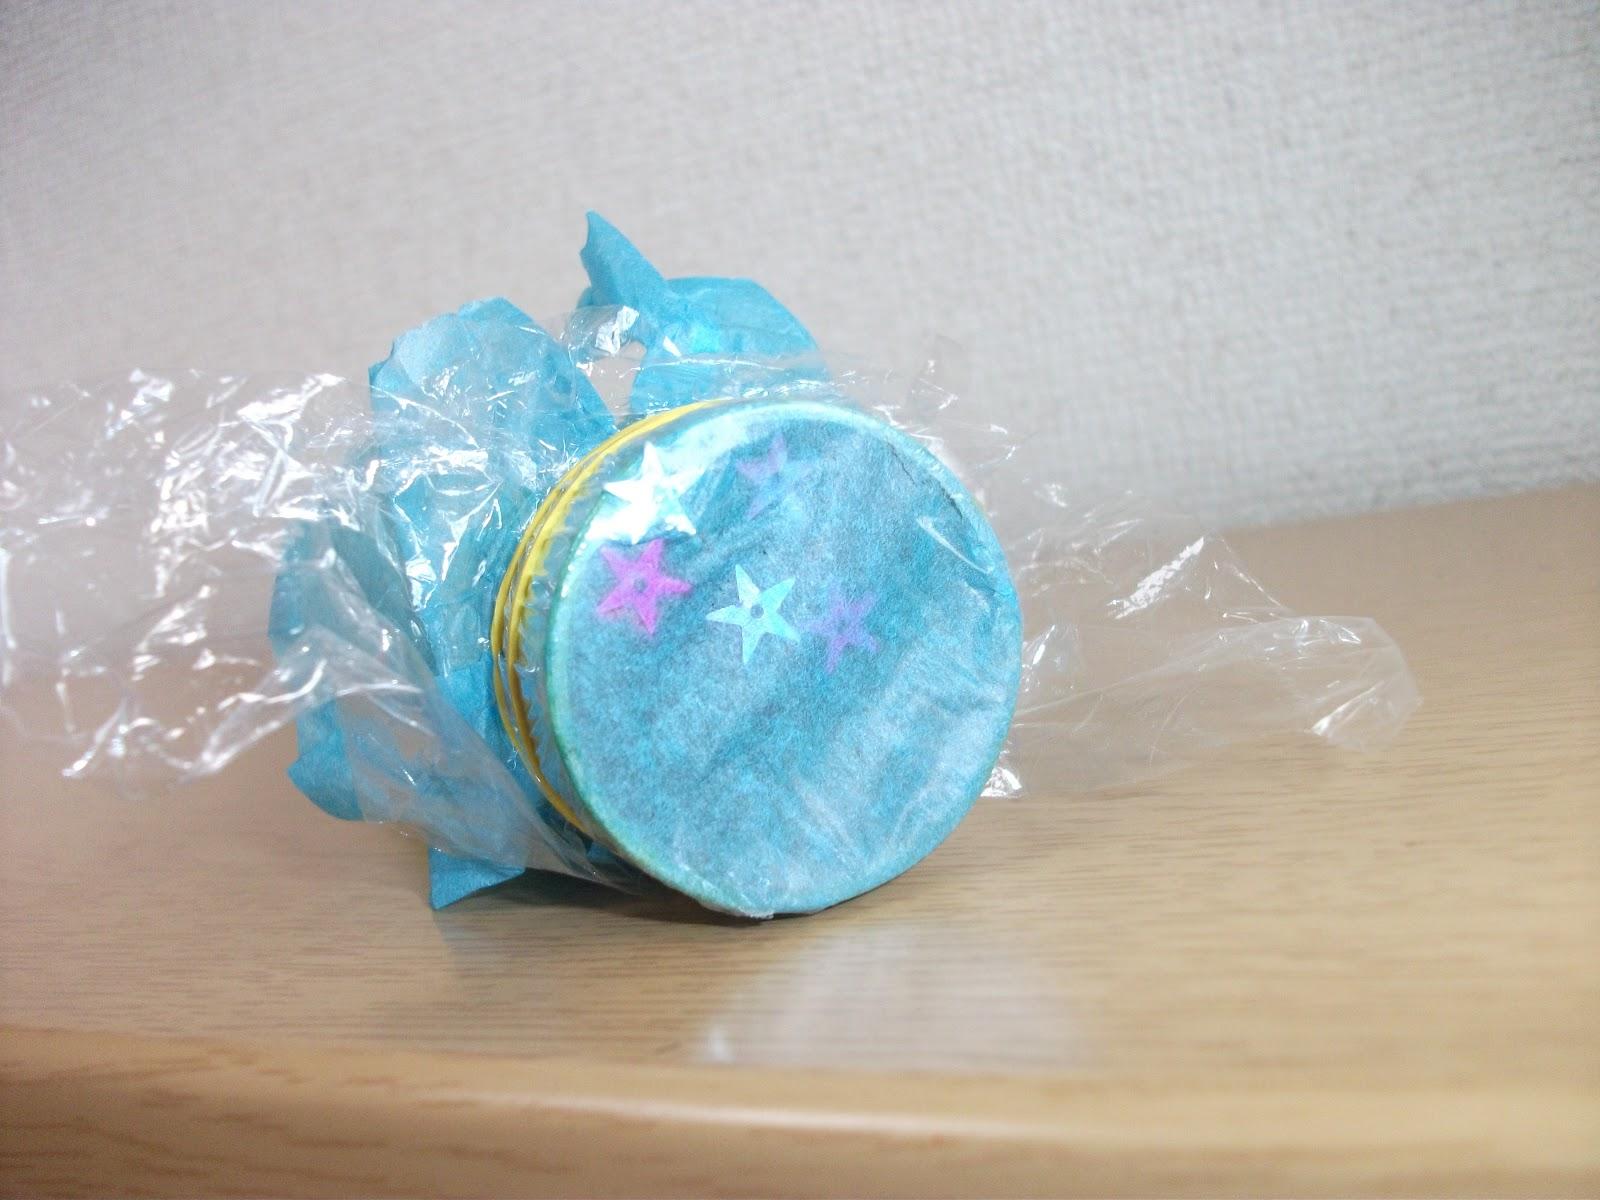 Preschool Crafts For Kids*: Space Cardboard Roll Telescope